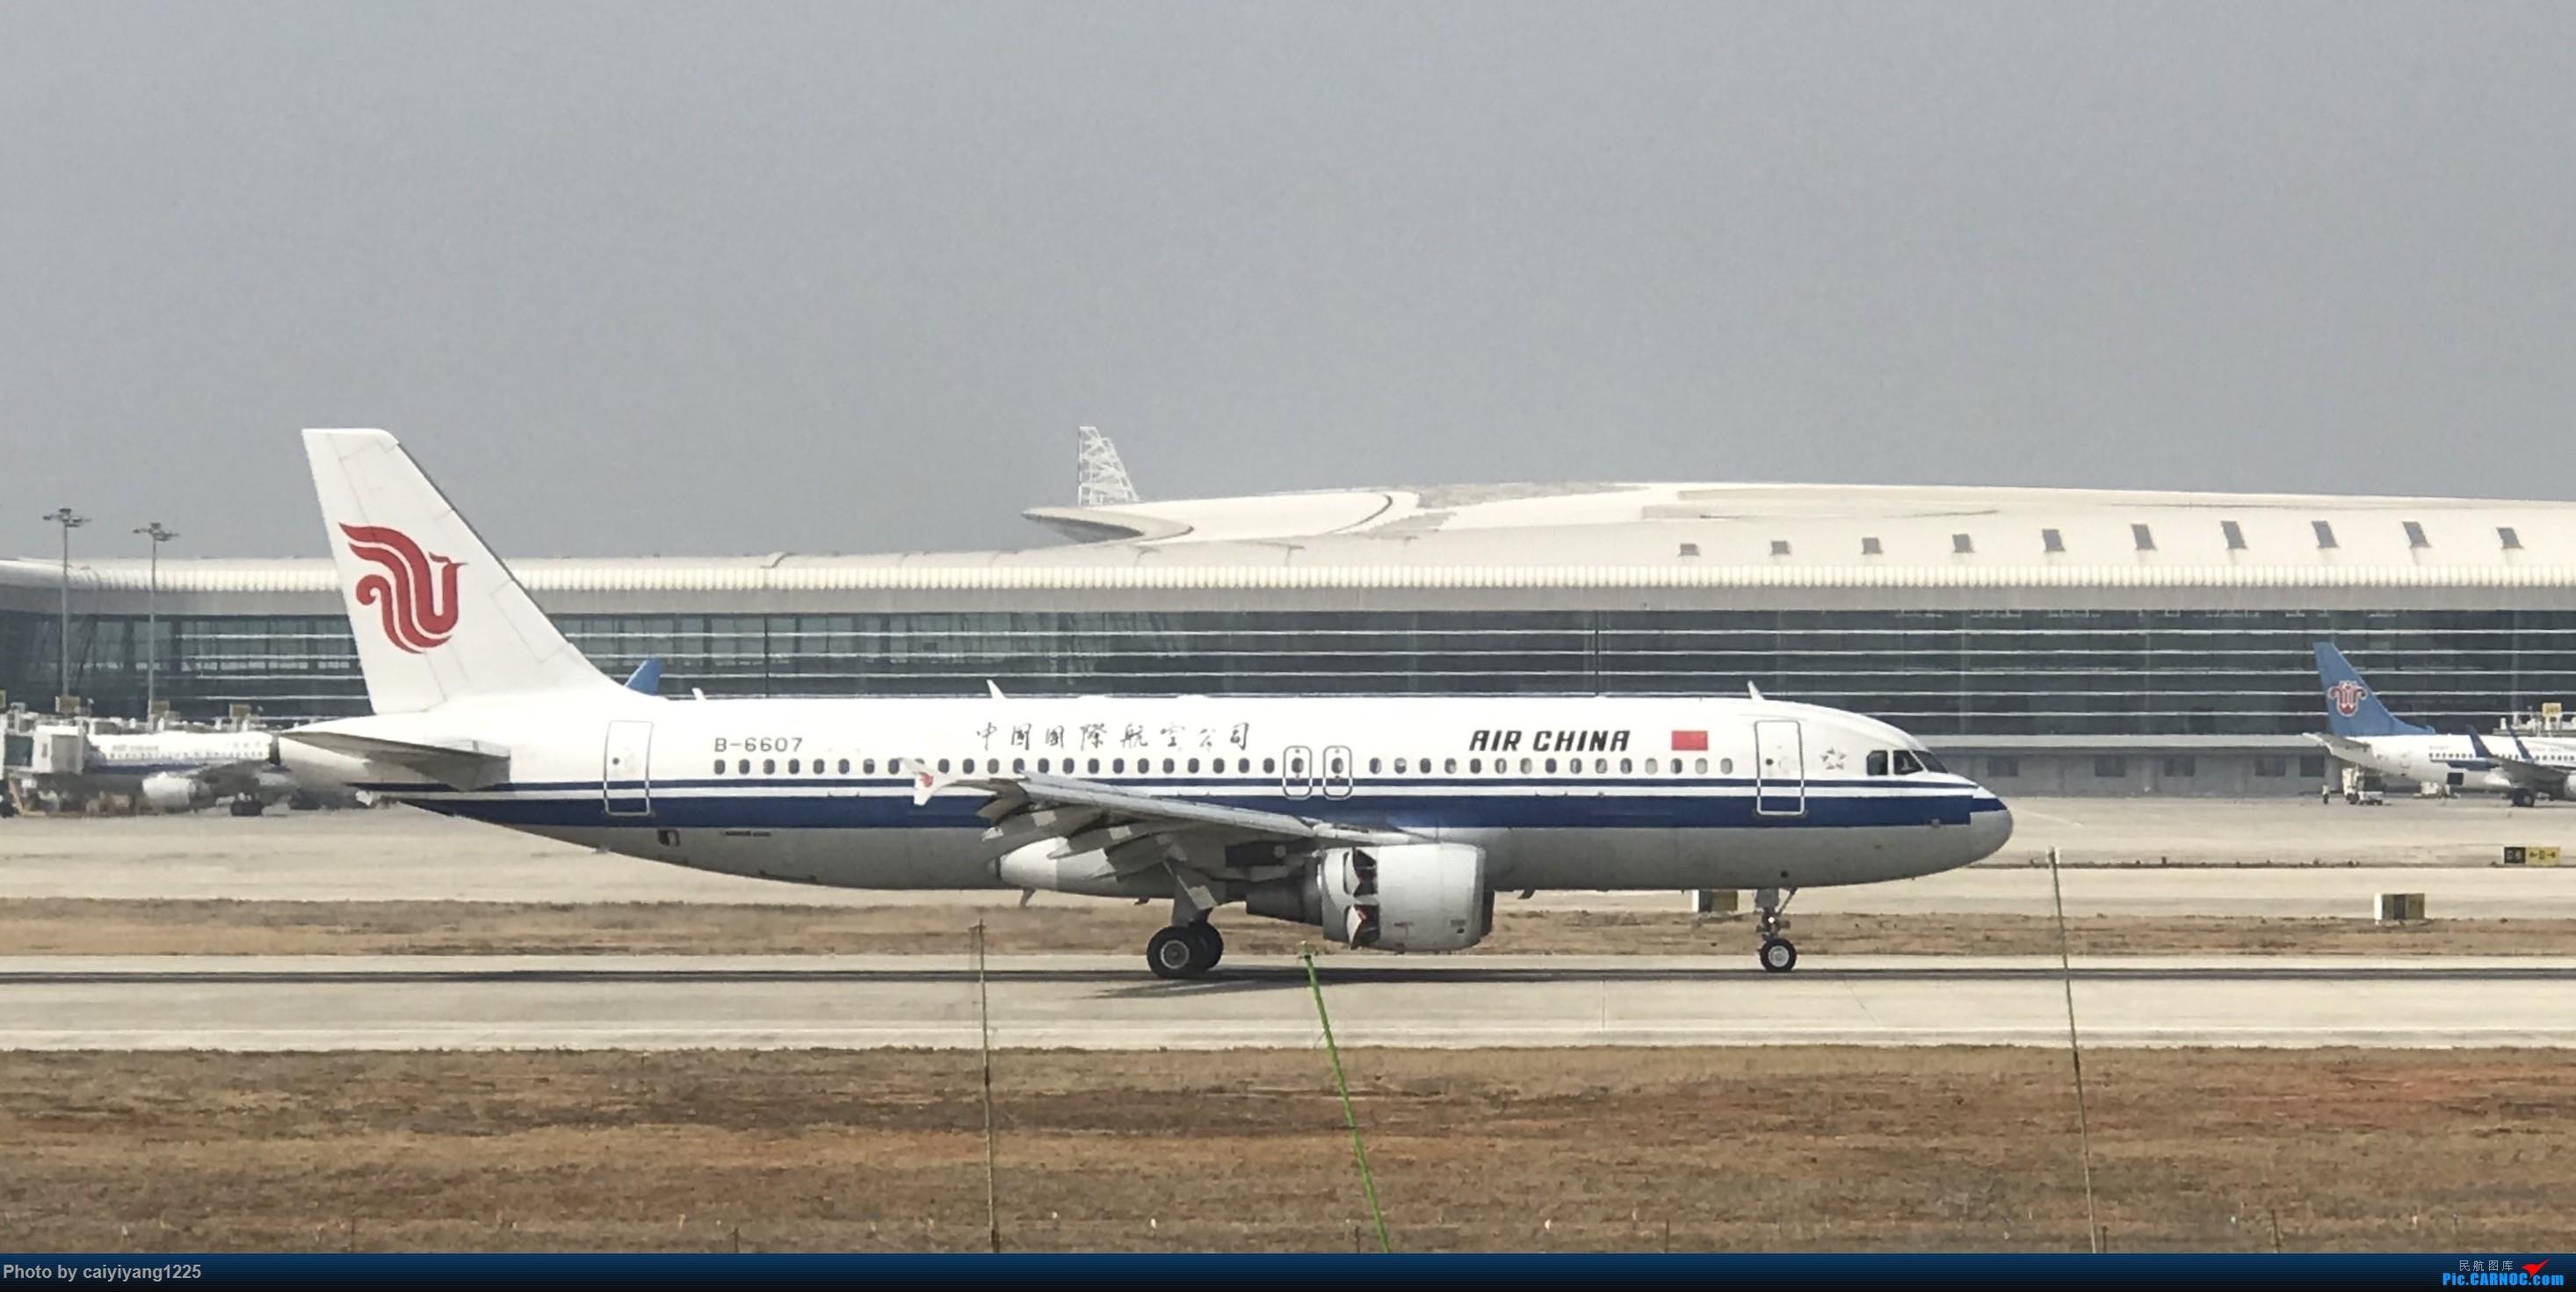 Re:[原创]武汉国庆拍机ps:出门忘带相机 拿手机拍的烂货请见谅! AIRBUS A320-200 B-6607 武汉天河国际机场